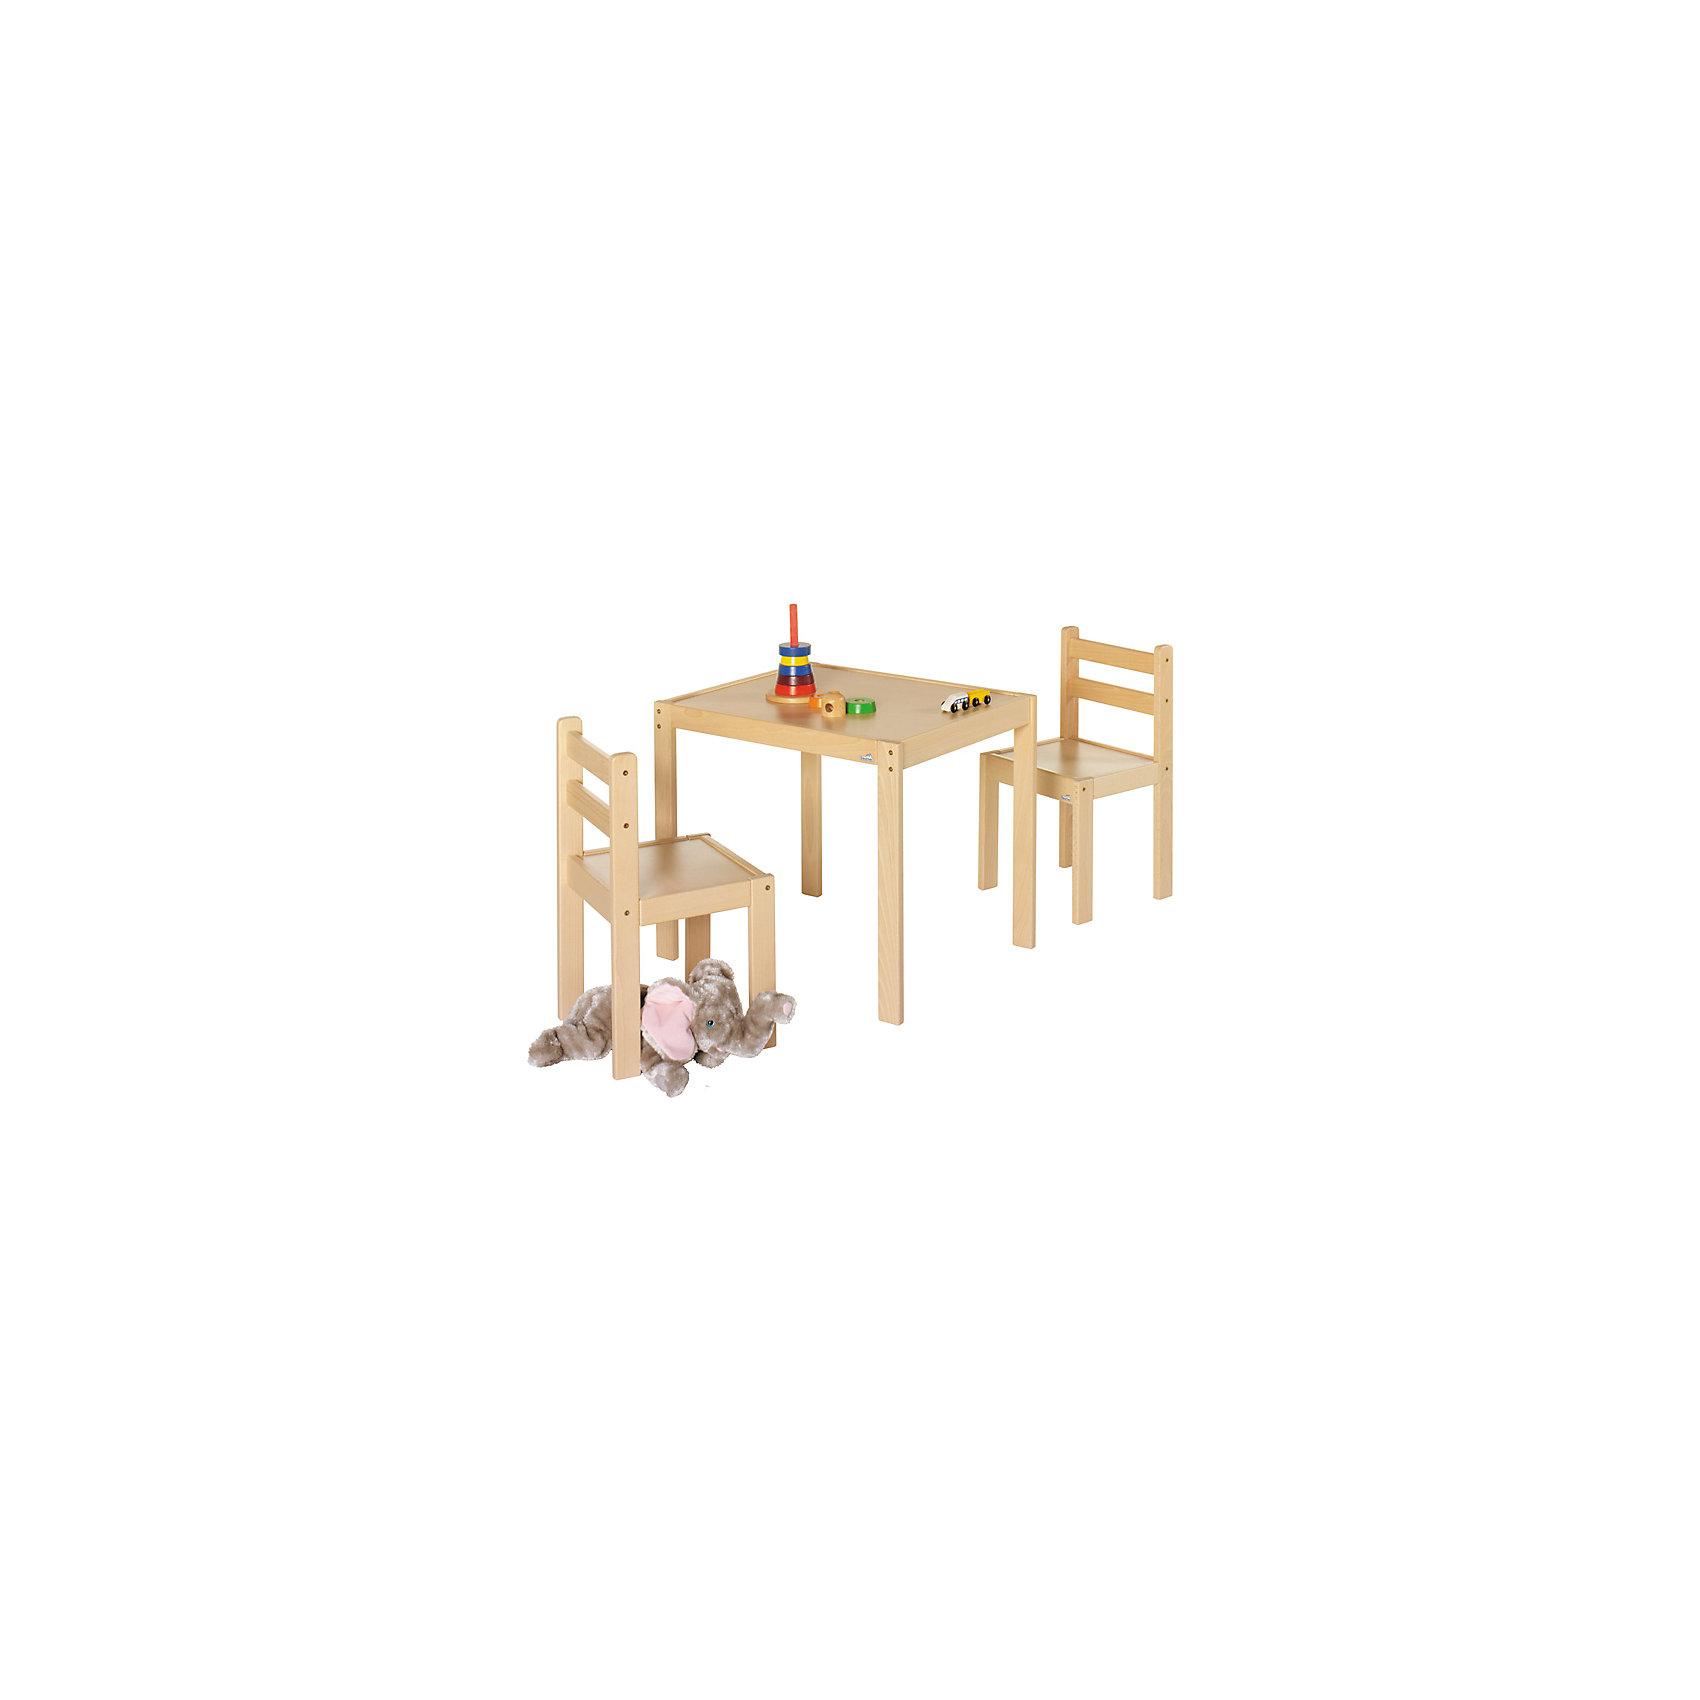 Geuther Комплект игровой мебели Kalle&Co (стол и 2 стула), Geuther велосипед geuther велосипед minibike 2 в 1 желтый